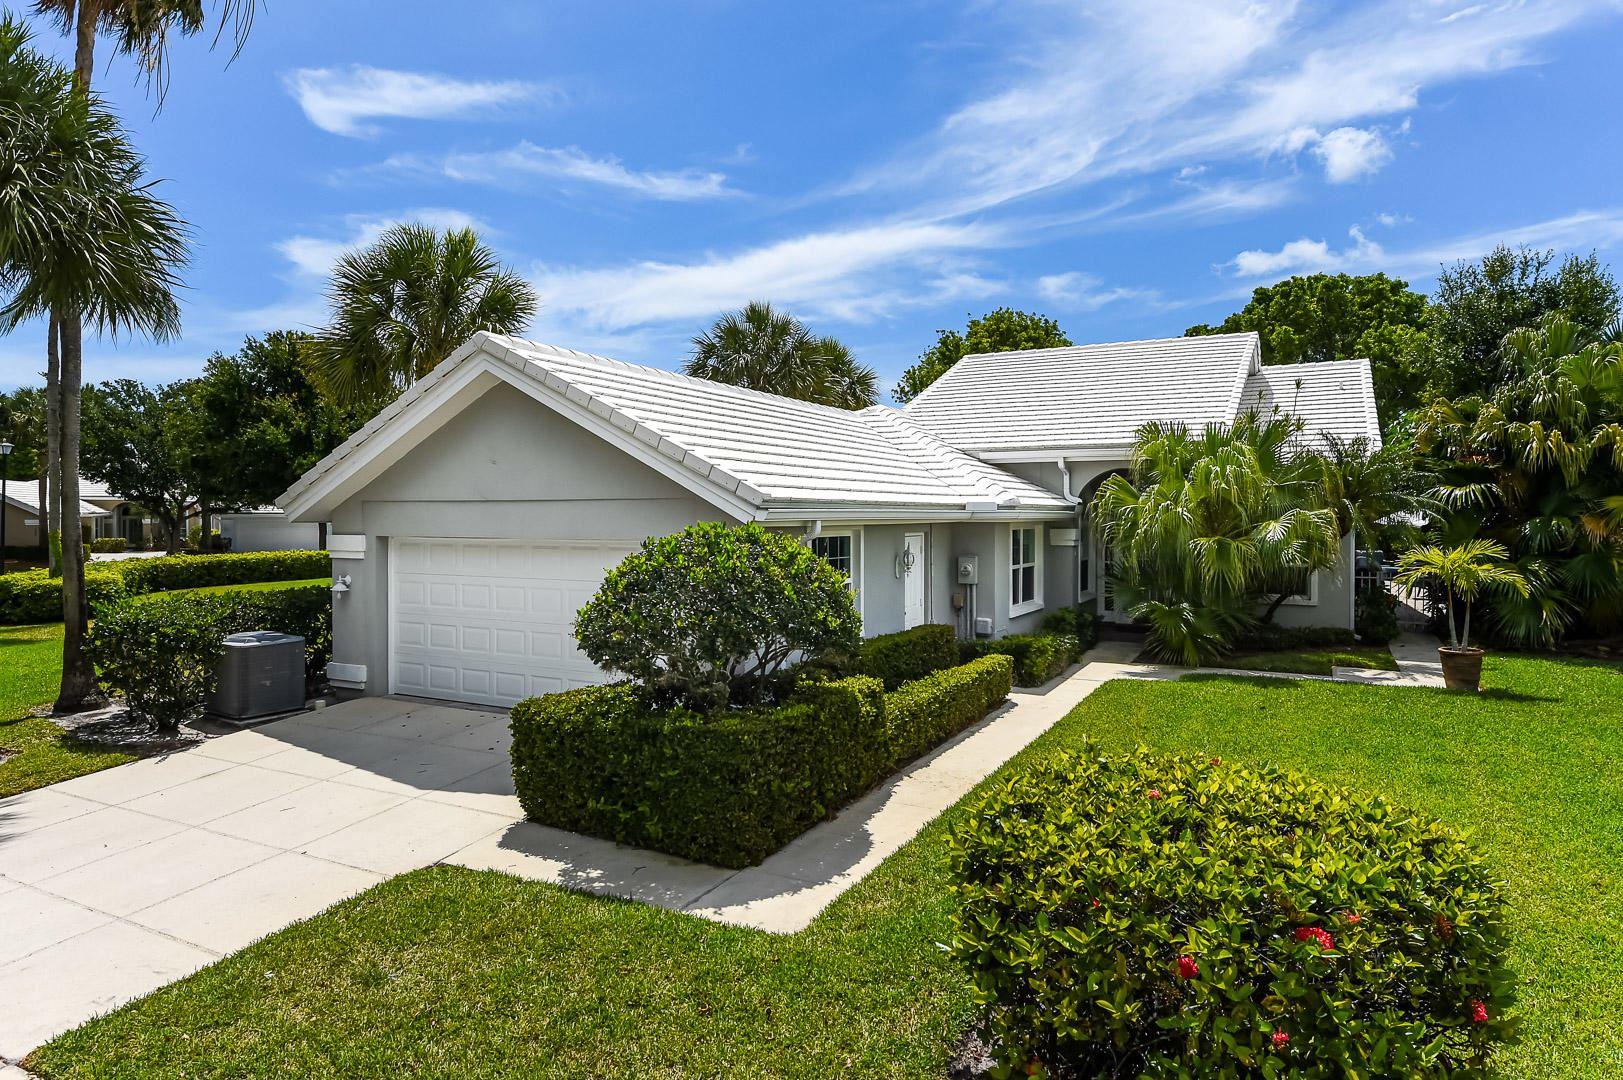 2730 Meadowlark Lane, West Palm Beach, FL 33409 - MLS#: RX-10714961